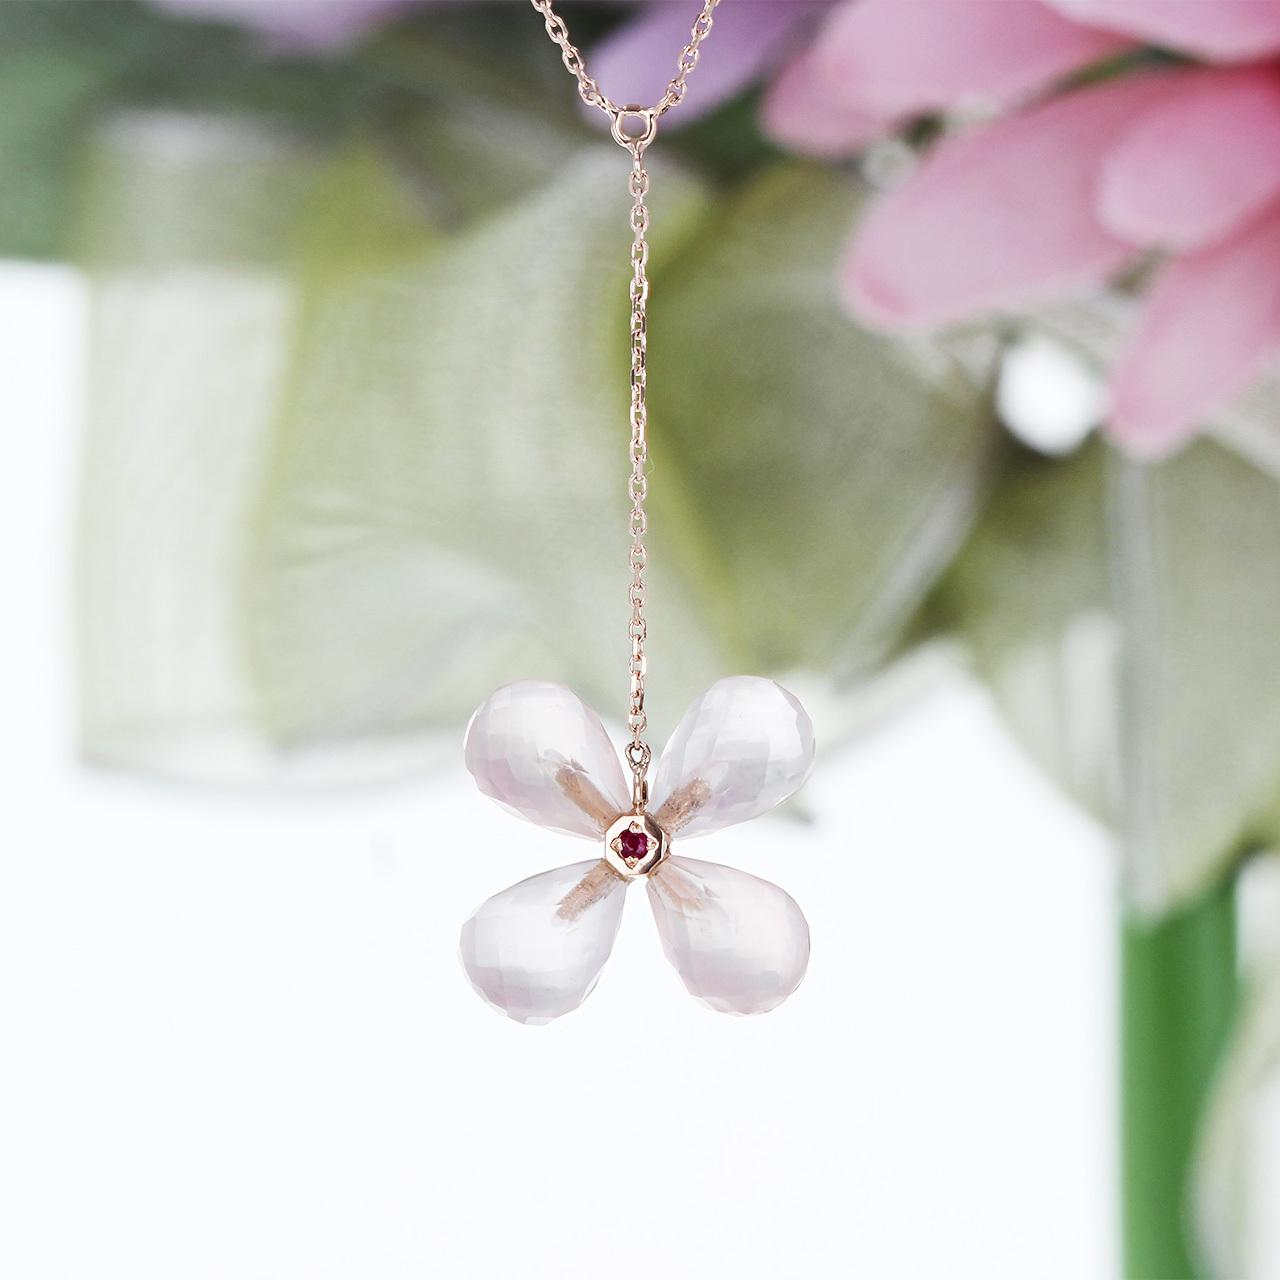 K10PG / ネックレス / Flower〜いろいろなお花のかたち〜 雫型ローズクォーツ × ルビーのお花のかたち